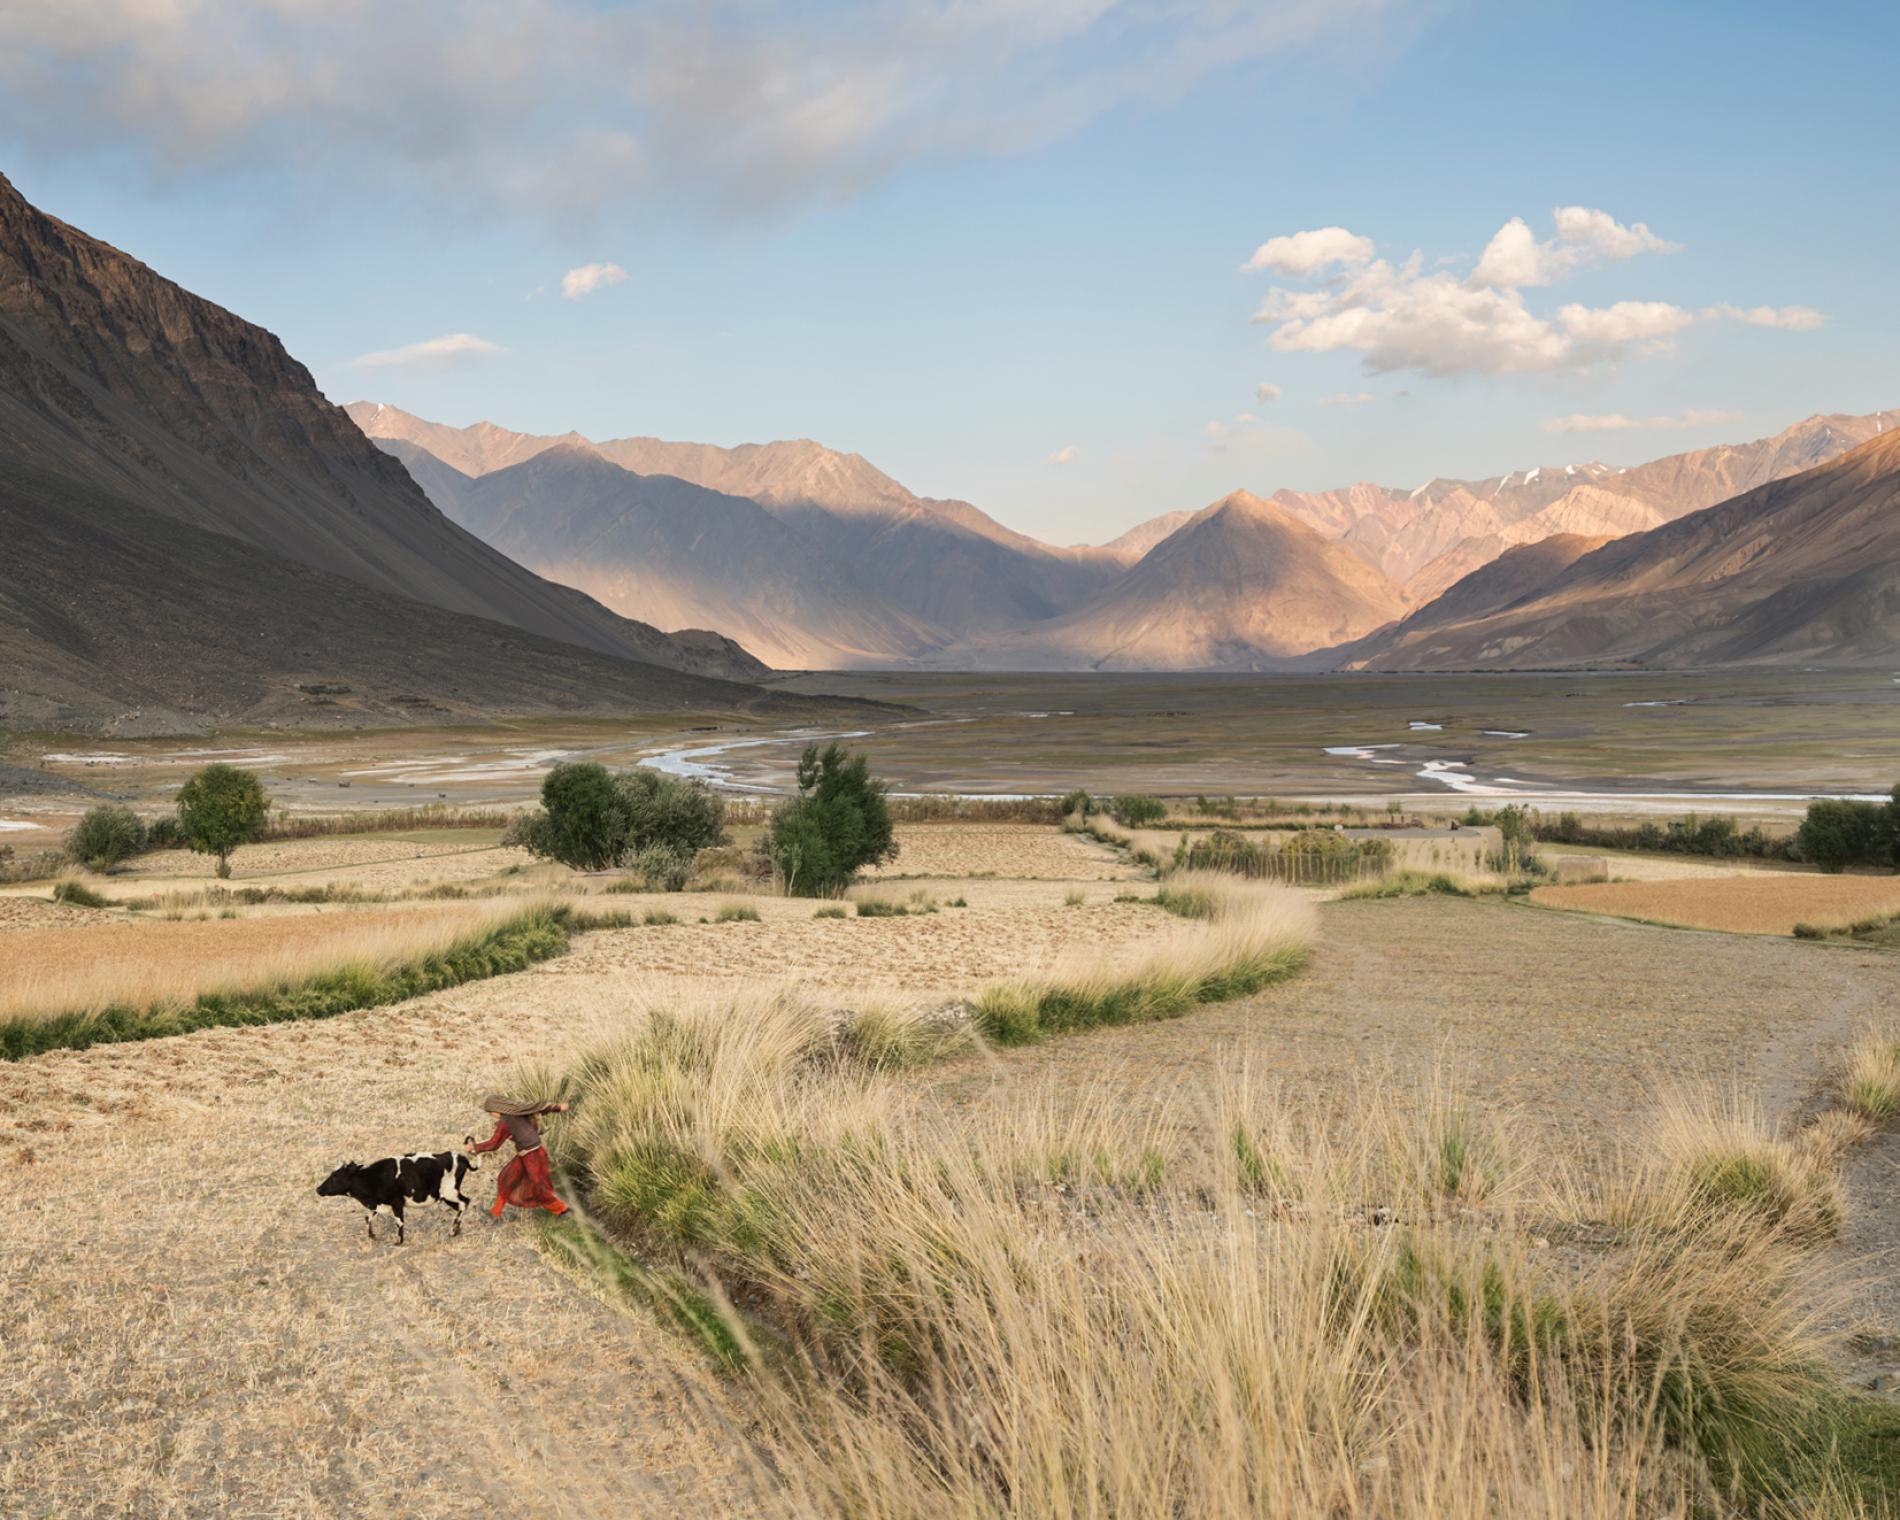 Central asia (mongolia?) 2018